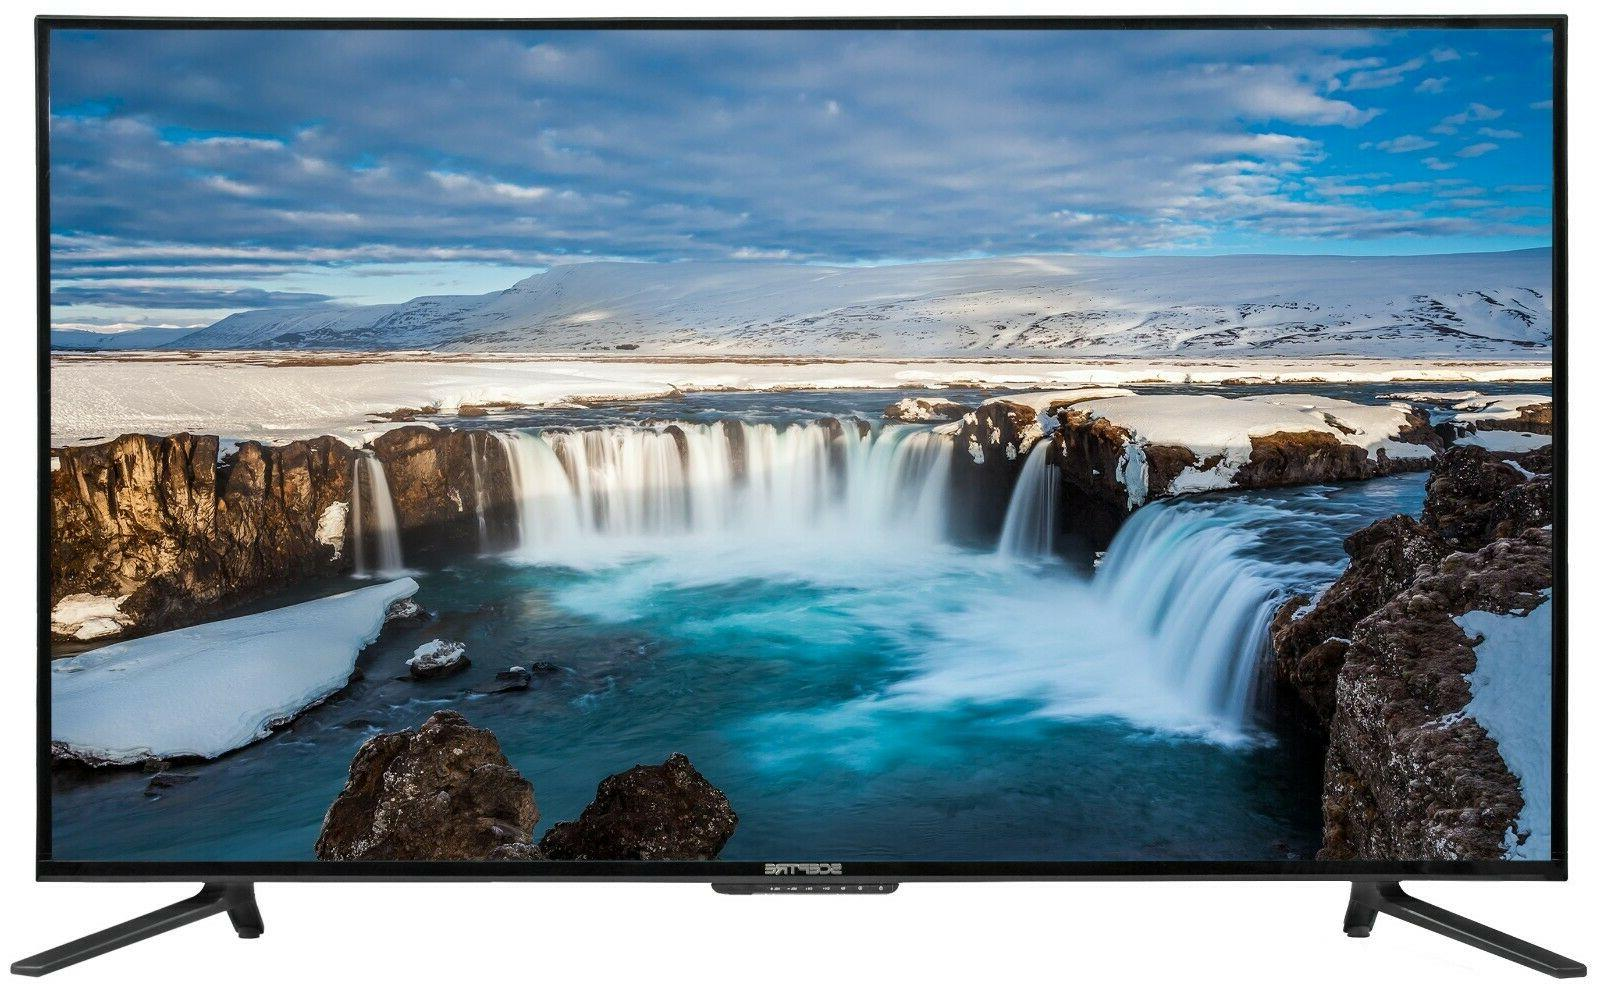 "Sceptre 55"" Class 4K Ultra HD 2160P LED TV Surround Sound 60"